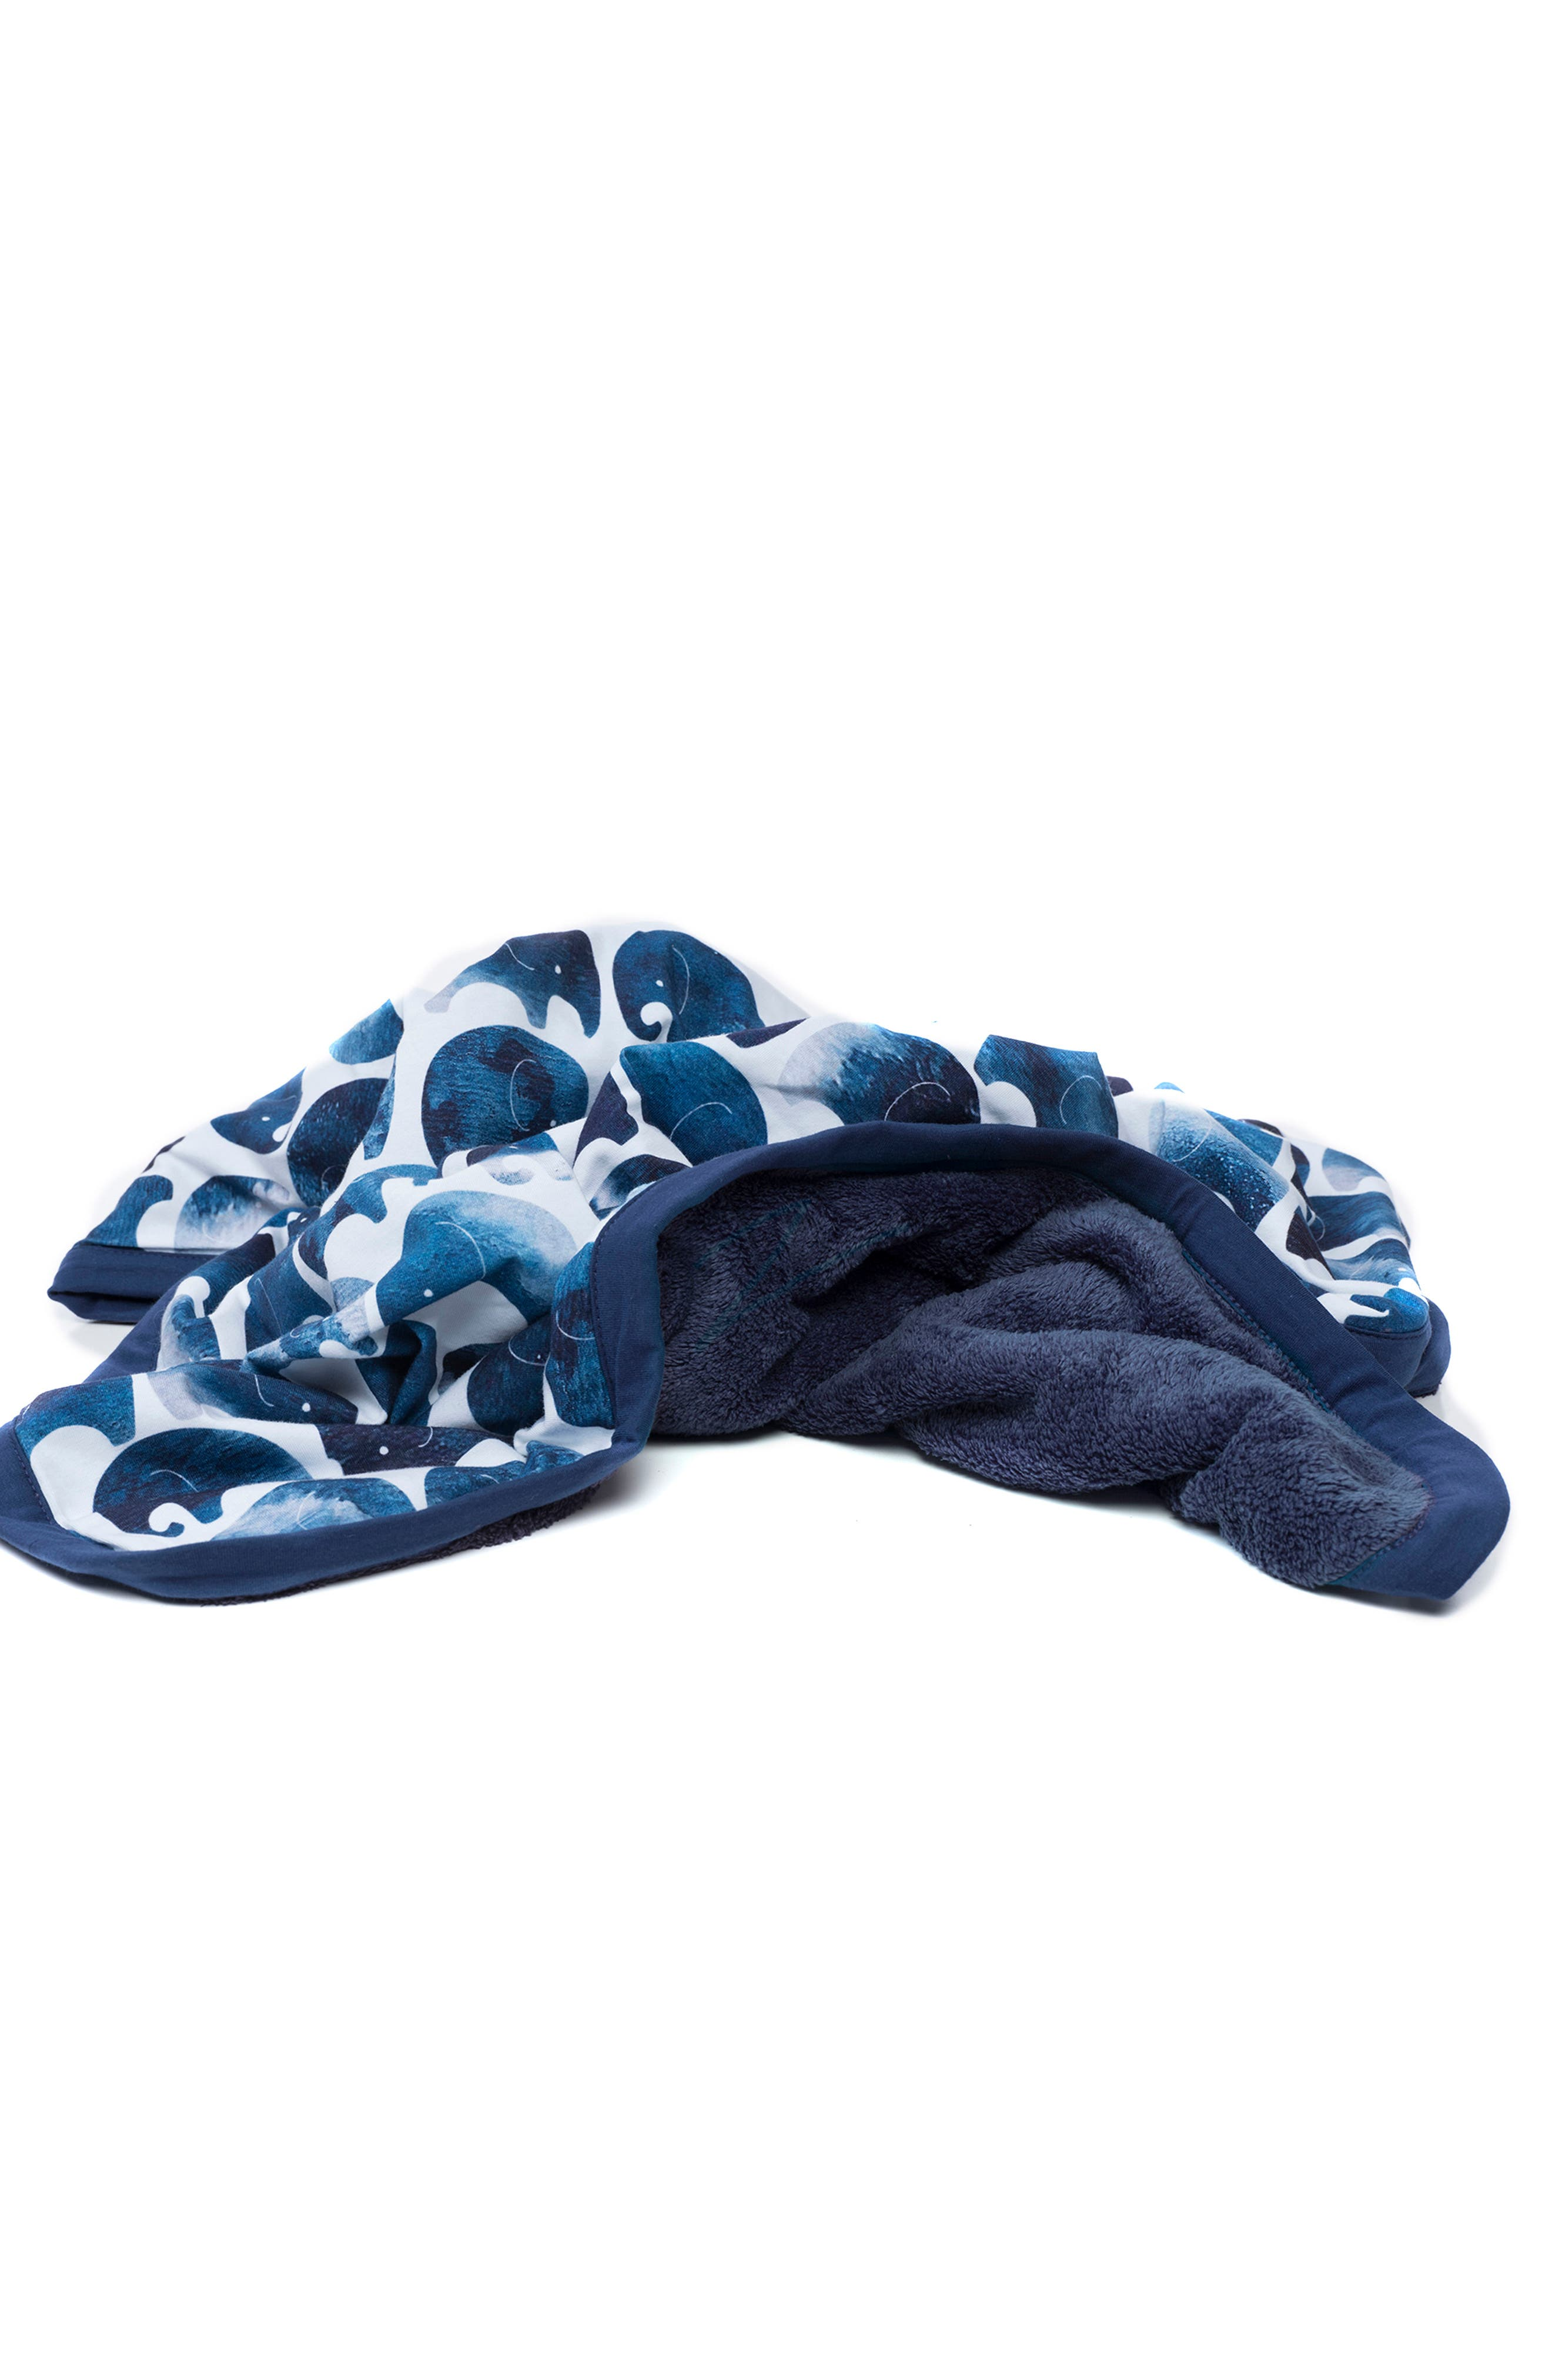 Elefant Cuddle Blanket,                             Alternate thumbnail 5, color,                             ELEFANT